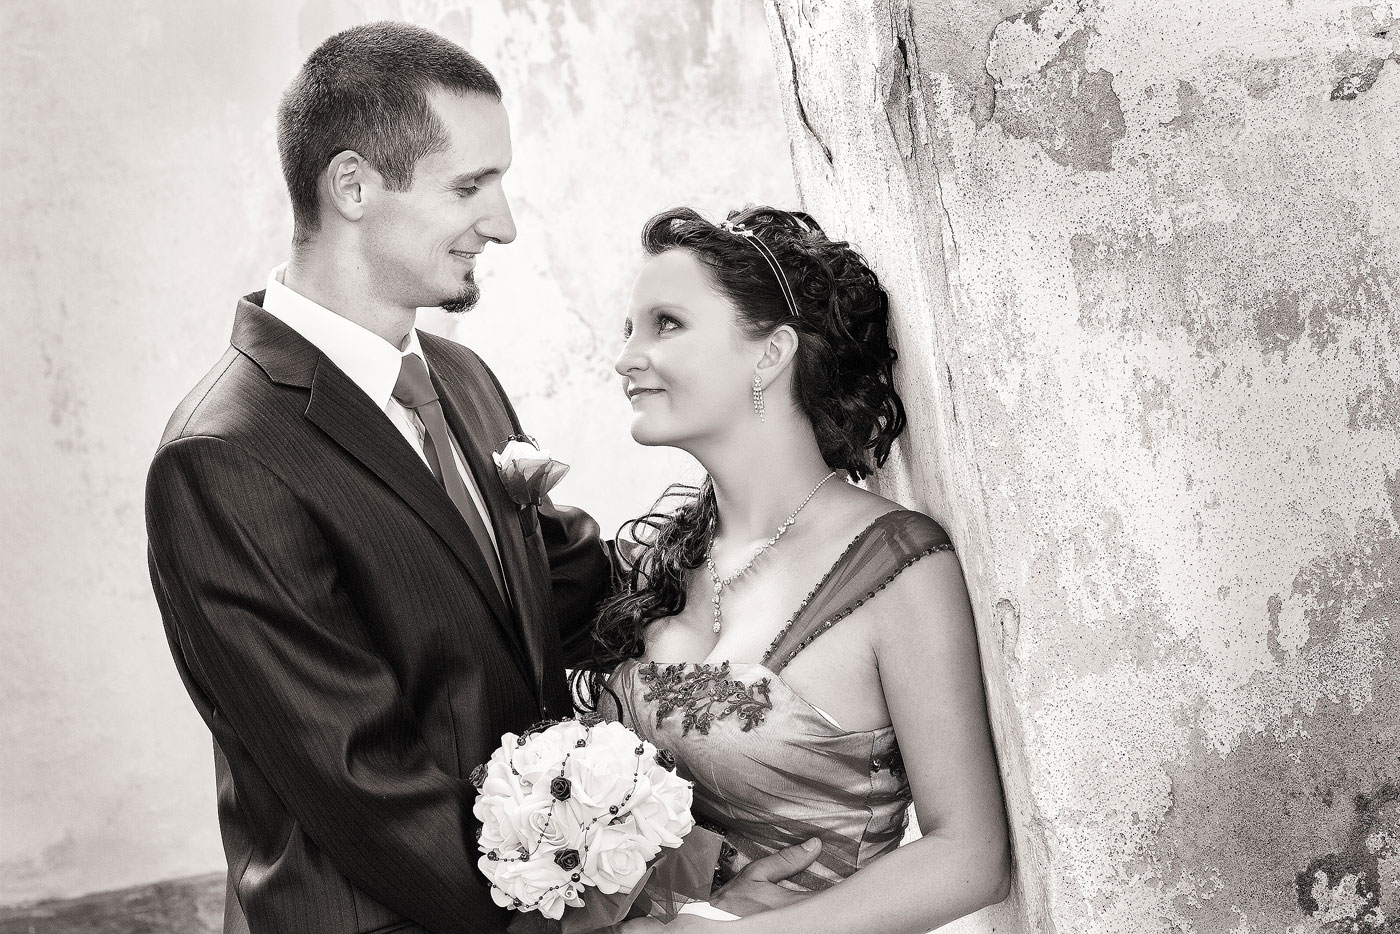 Svatba Velešín - svatební fotograf Český Krumlov